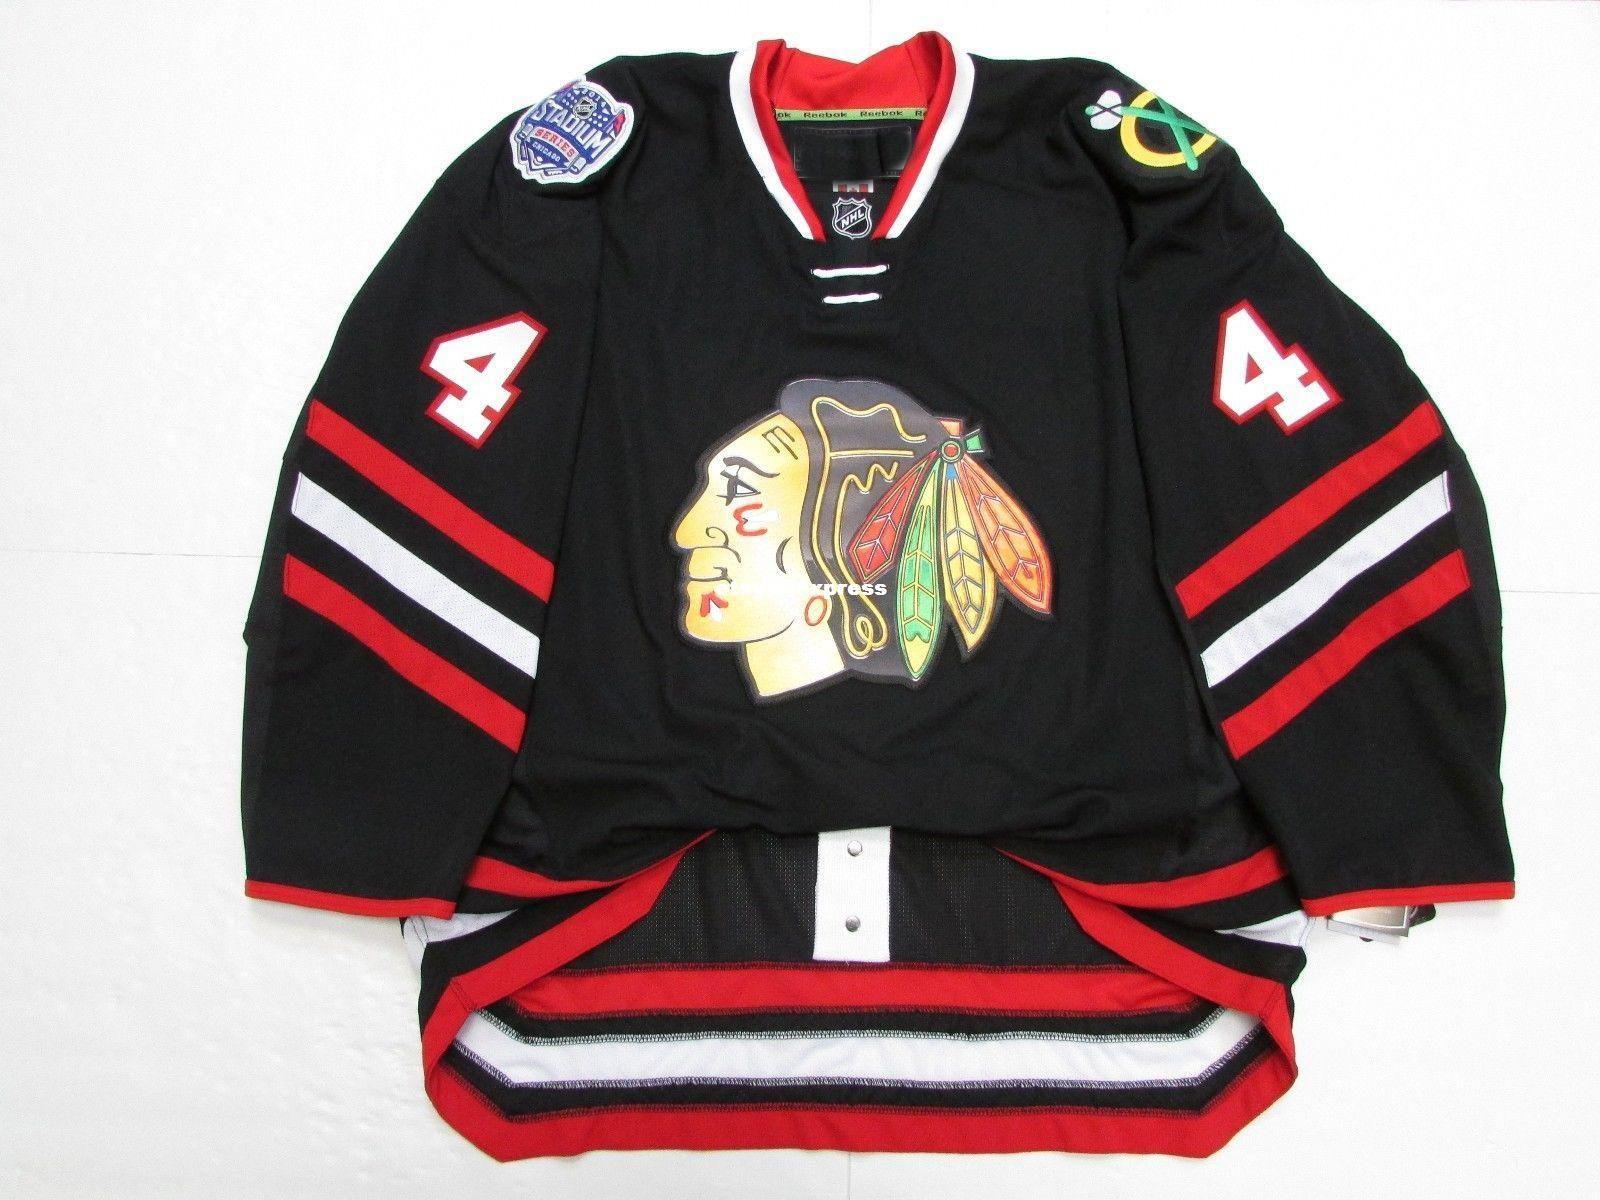 3346414464b 2019 Cheap Custom Niklas Hjalmarsson CHICAGO BLACKHAWKS 2014 STADIUM SERIES  JERSEY Stitch Add Any Number Any Name Mens Hockey Jersey XS 6XL From ...